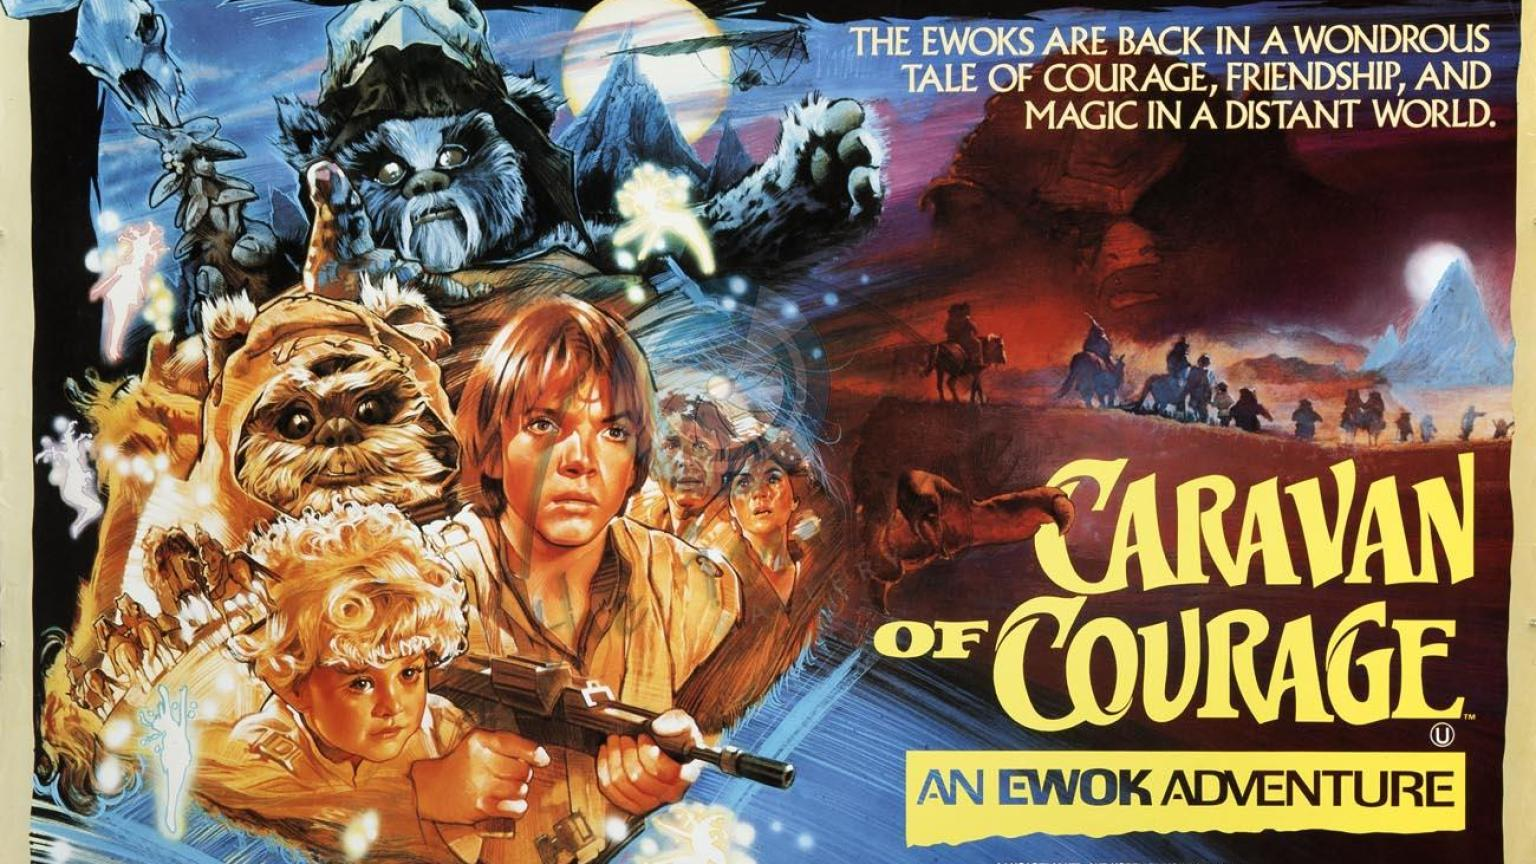 caravan of courage an ewok adventure poster